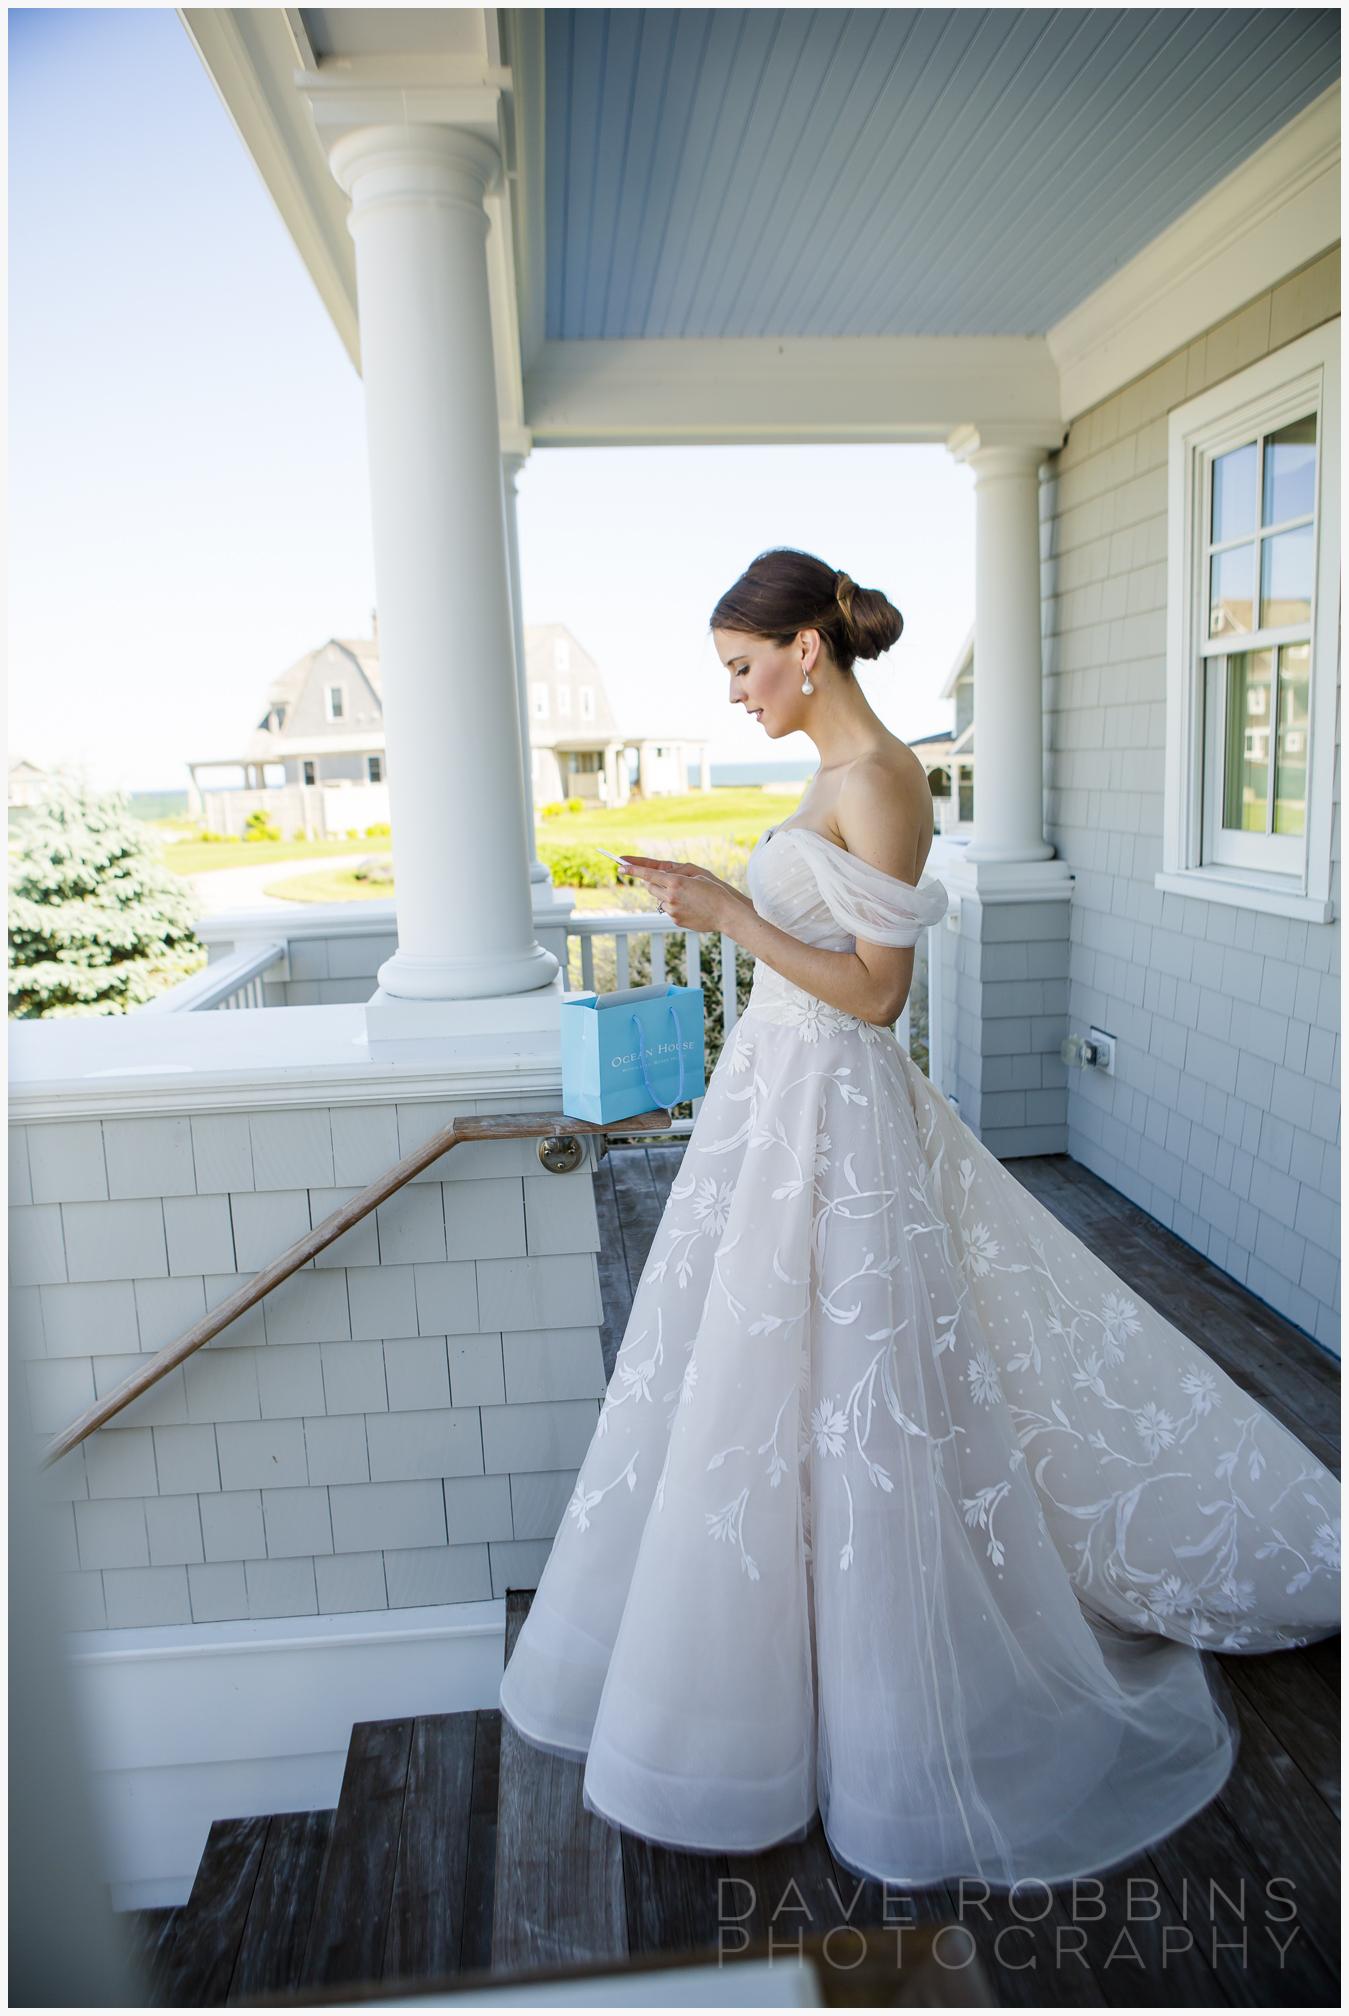 THE OCEAN HOUSE WEDDING 0017.JPG